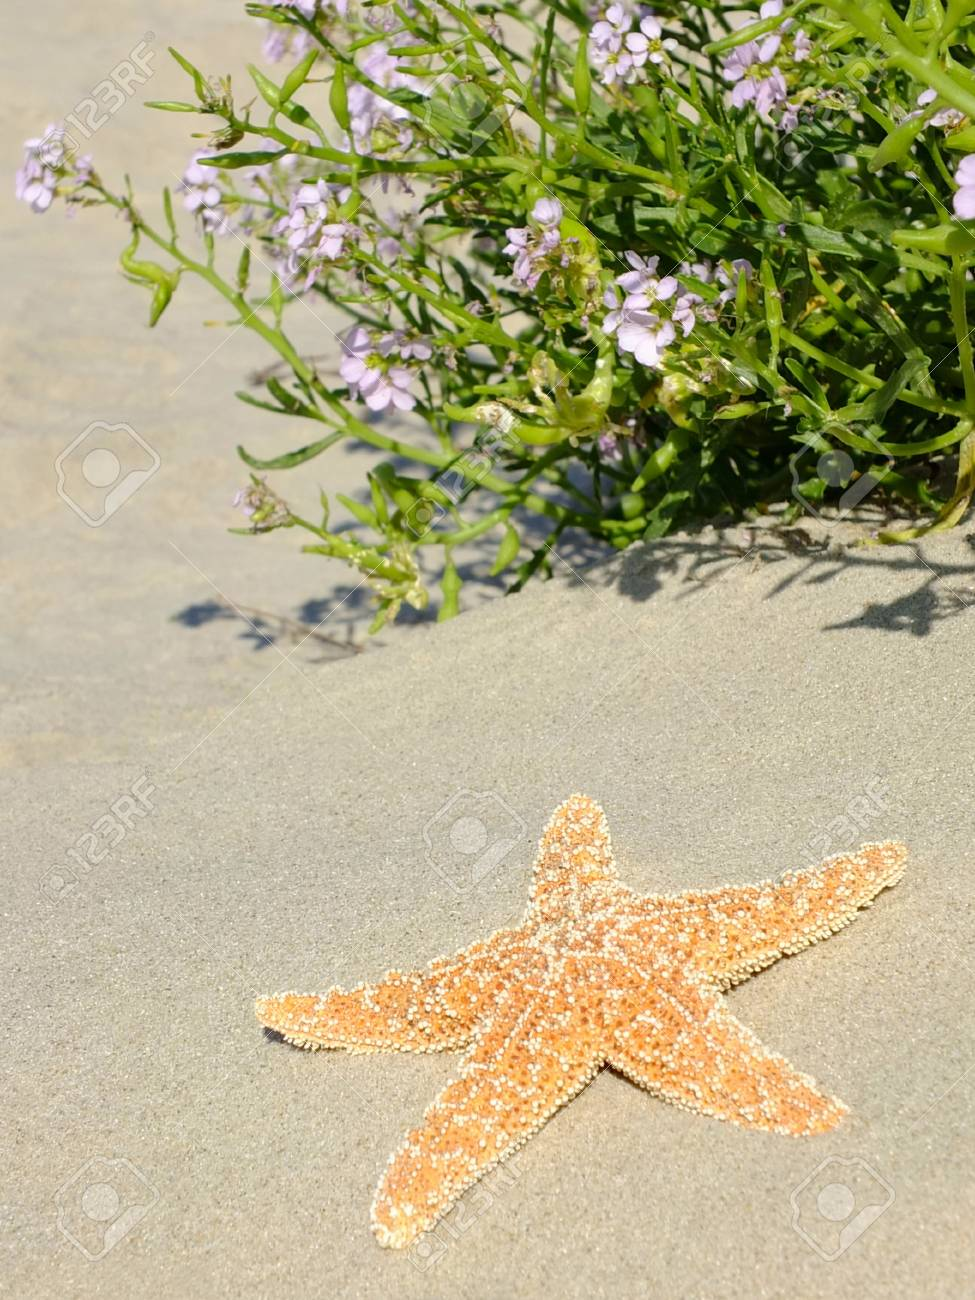 Image of a sea star Standard-Bild - 35403854